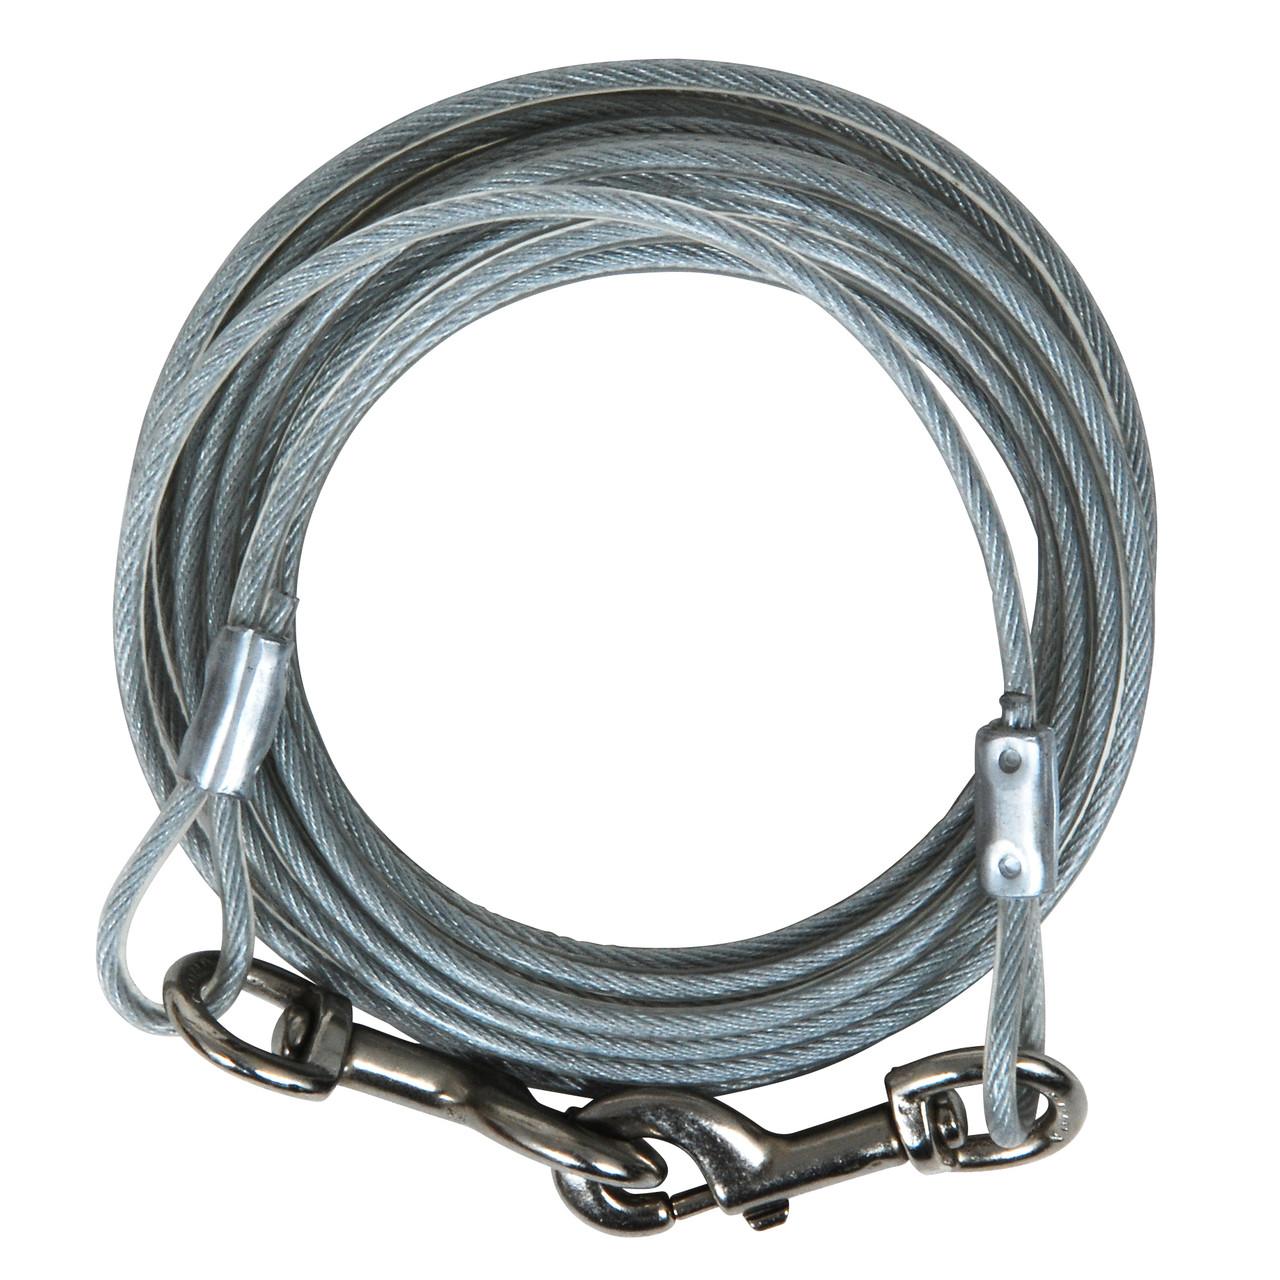 Aspen Pet Heavy Duty Dog Tie-Out Cable